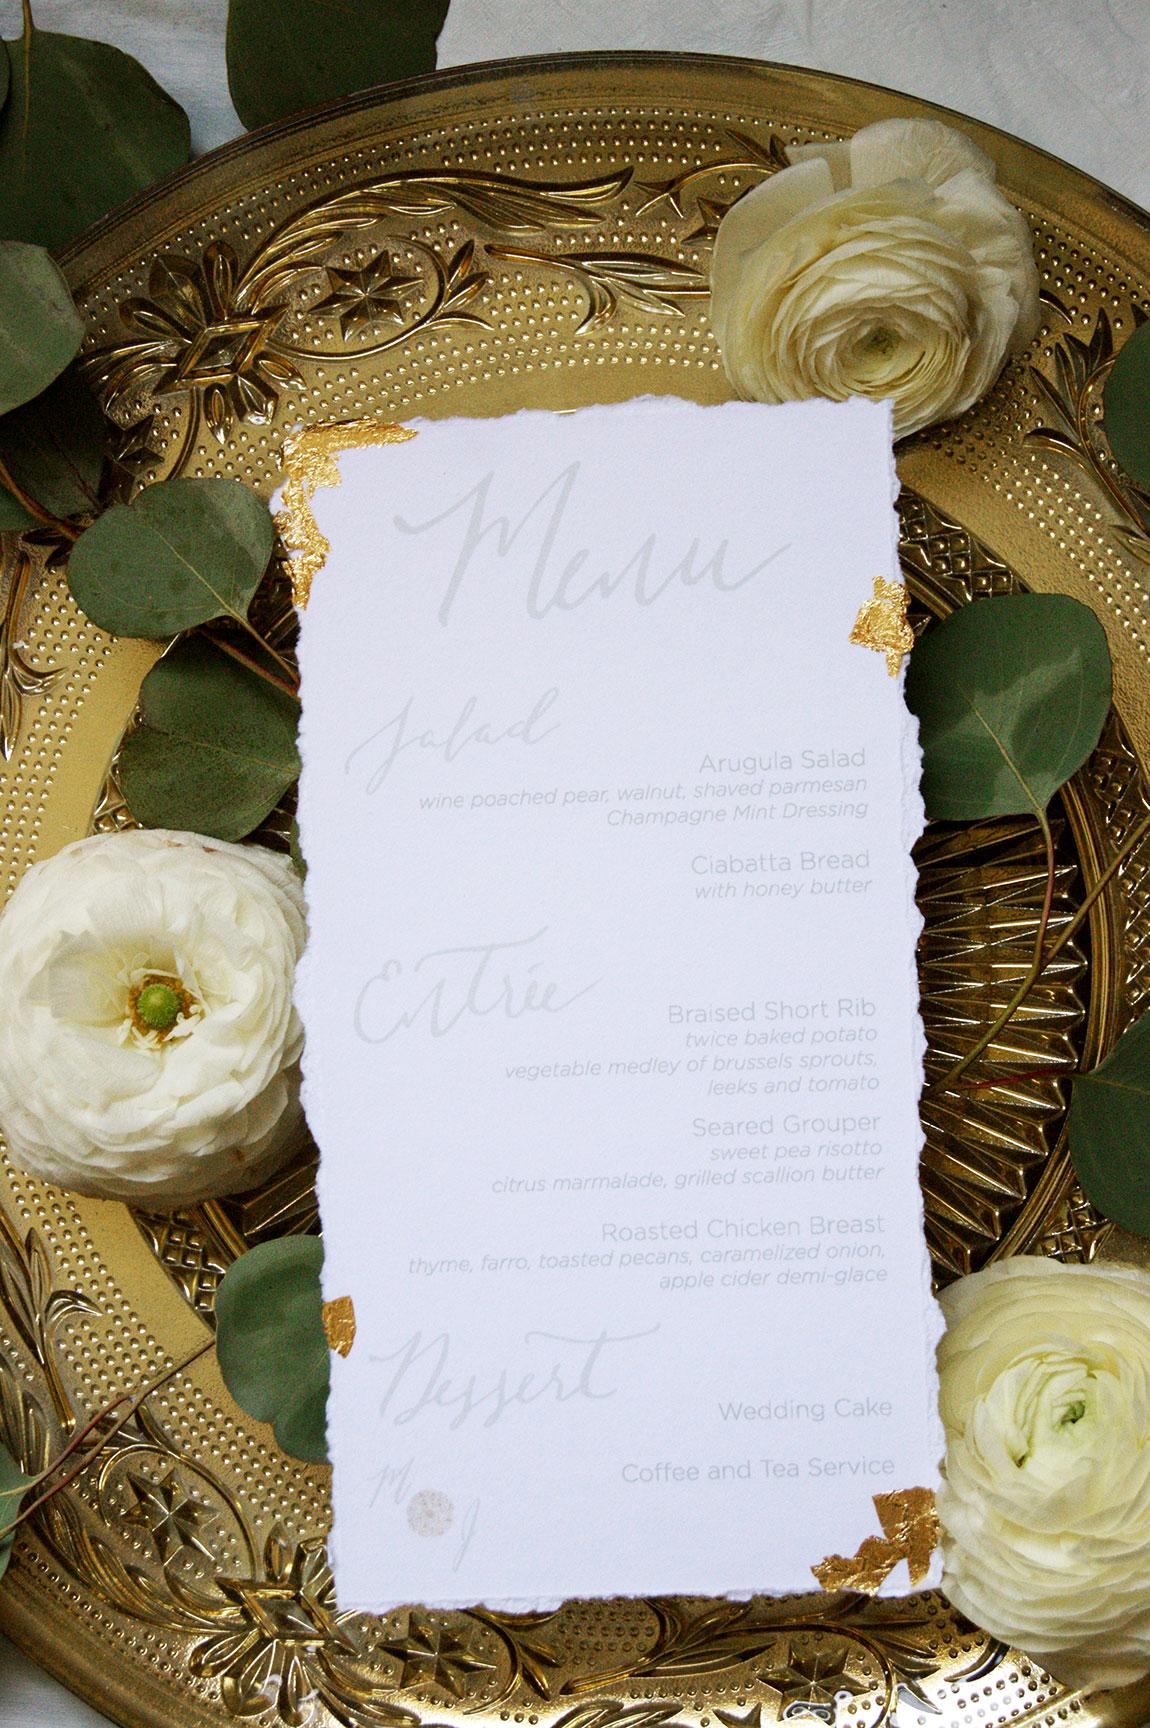 Kiawah Island Wedding Menu